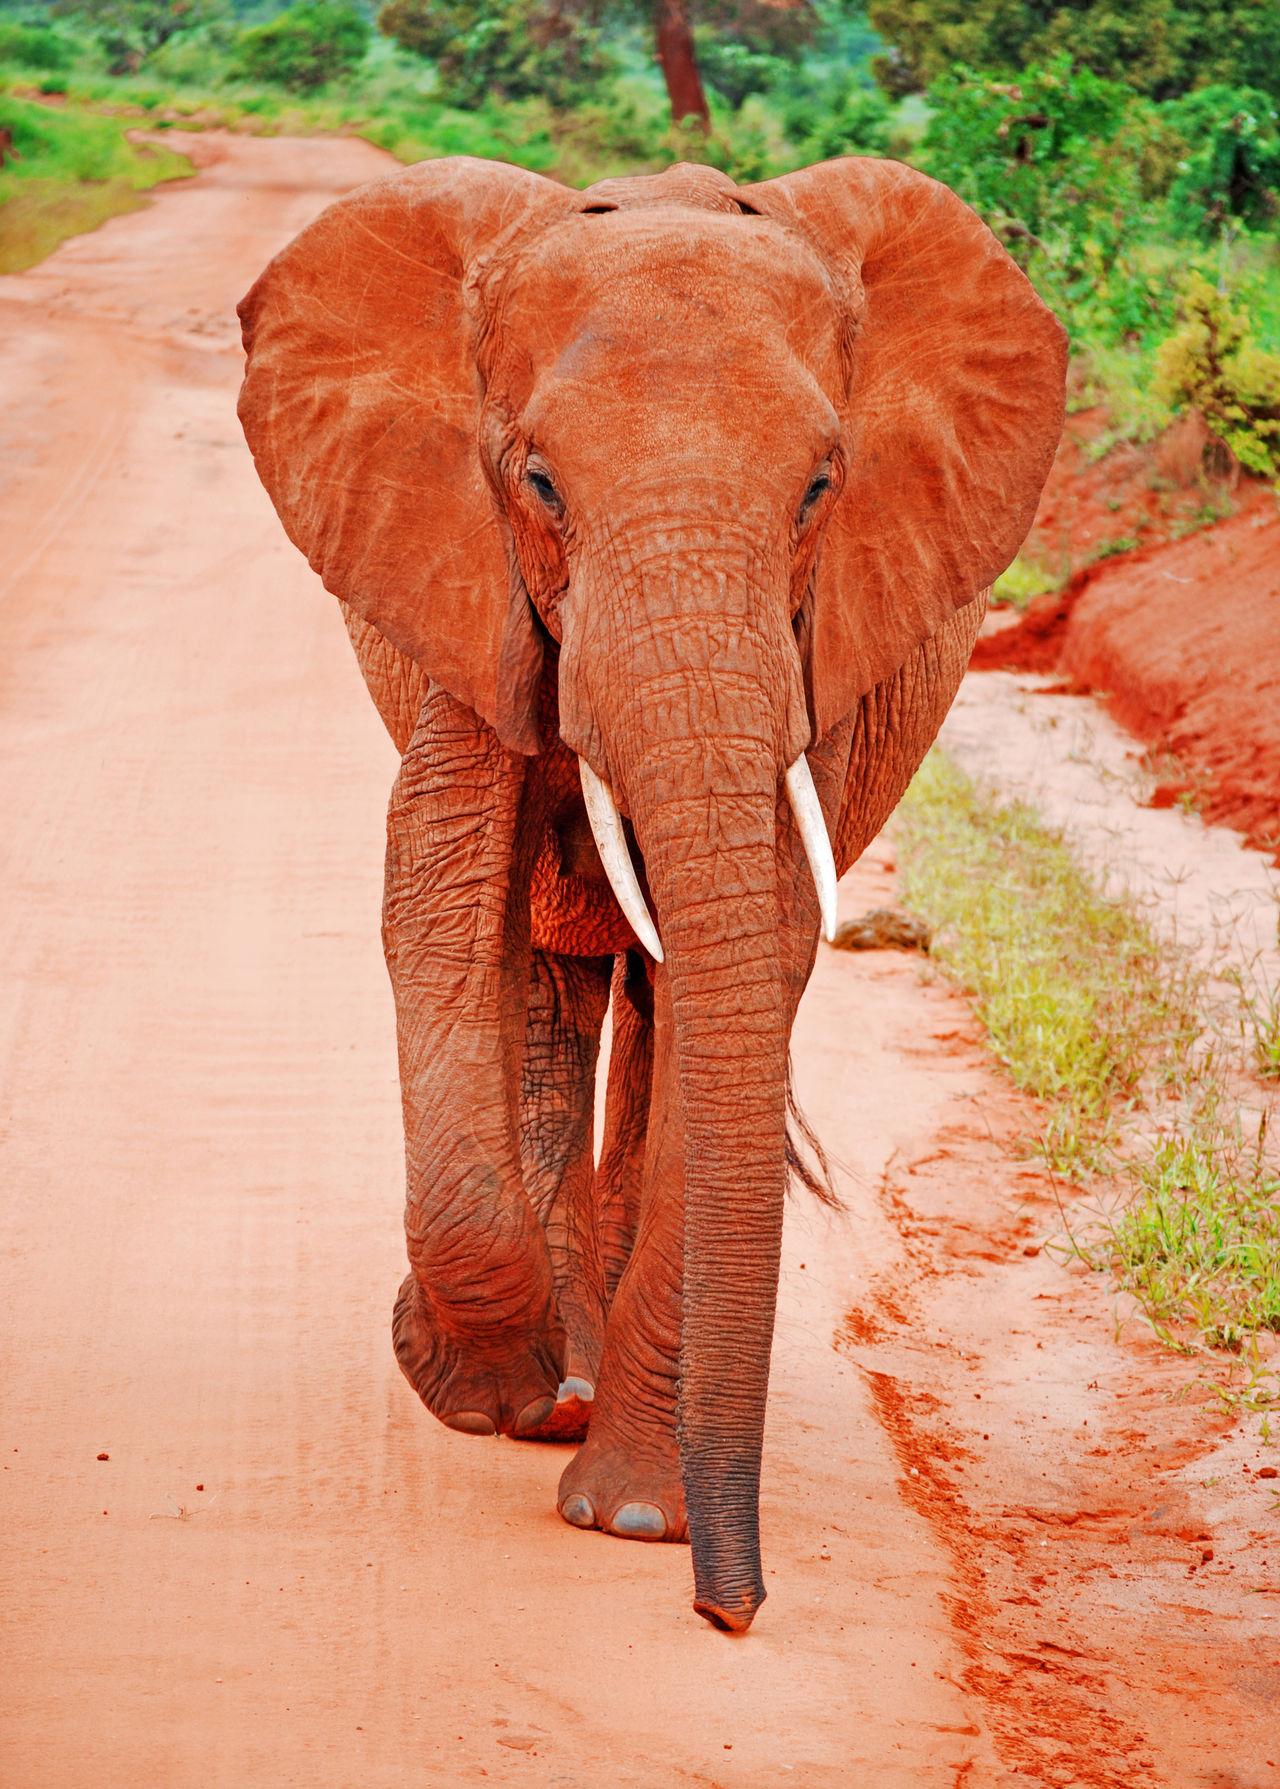 African Elephant Animal Animal Wildlife Animals In The Wild Elephant Kenya Kenyan Land Mammal Nature Outdoors Red Elephant Trunk Tusk